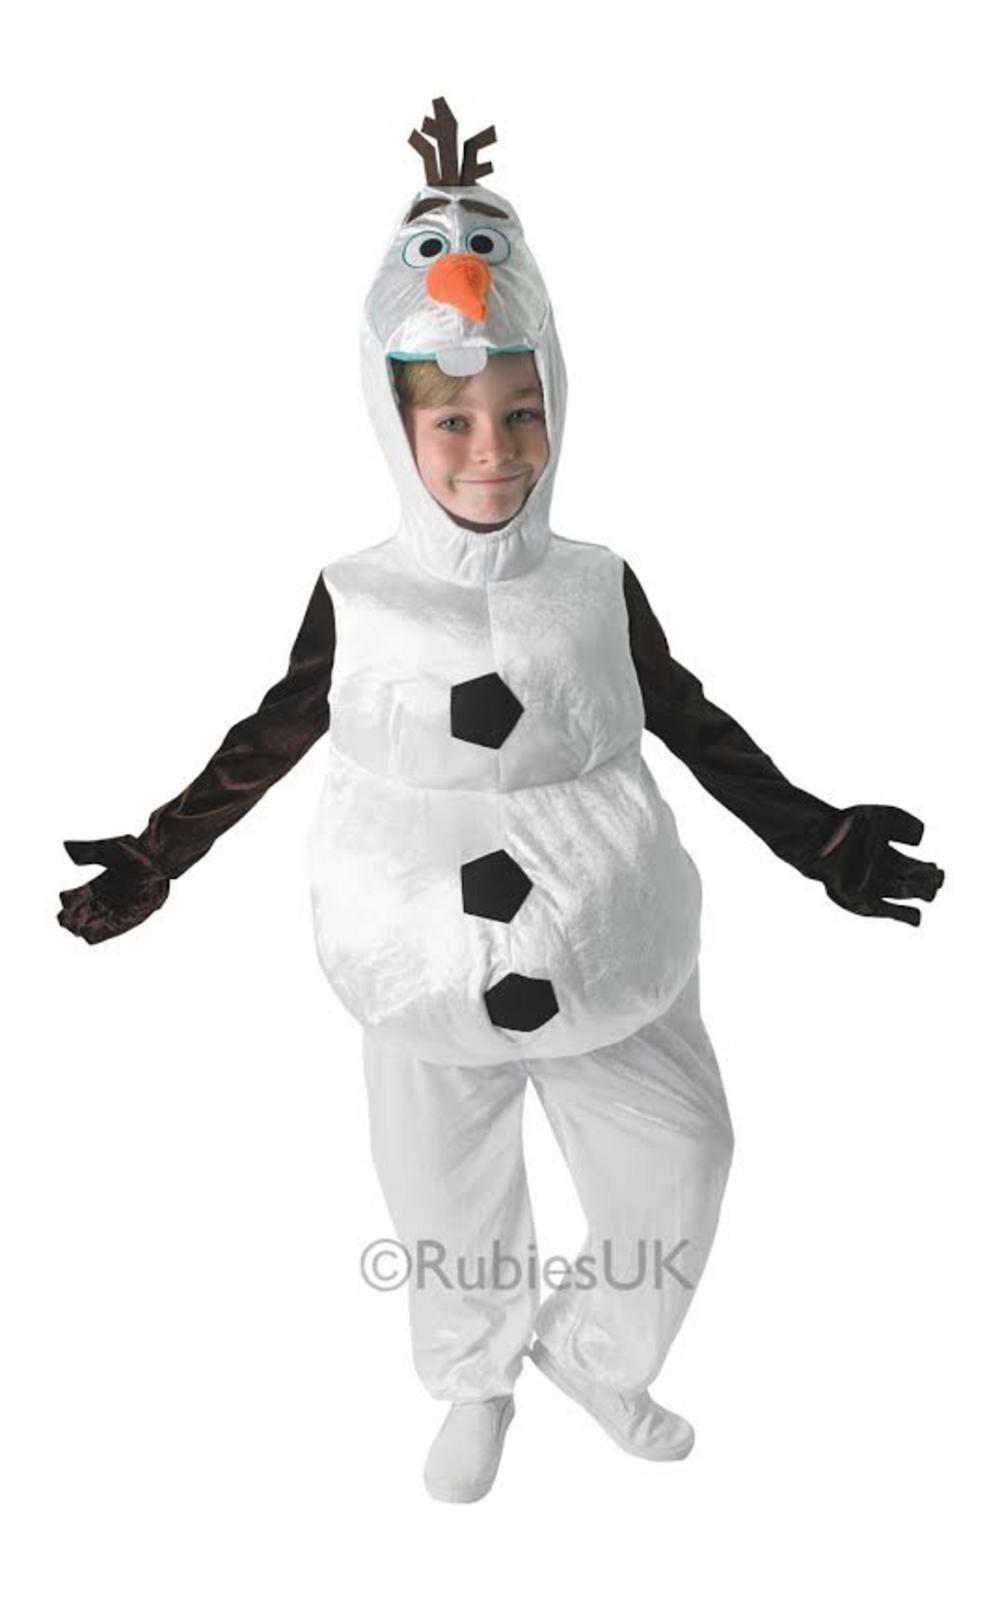 Disney Frozen Olaf Costume